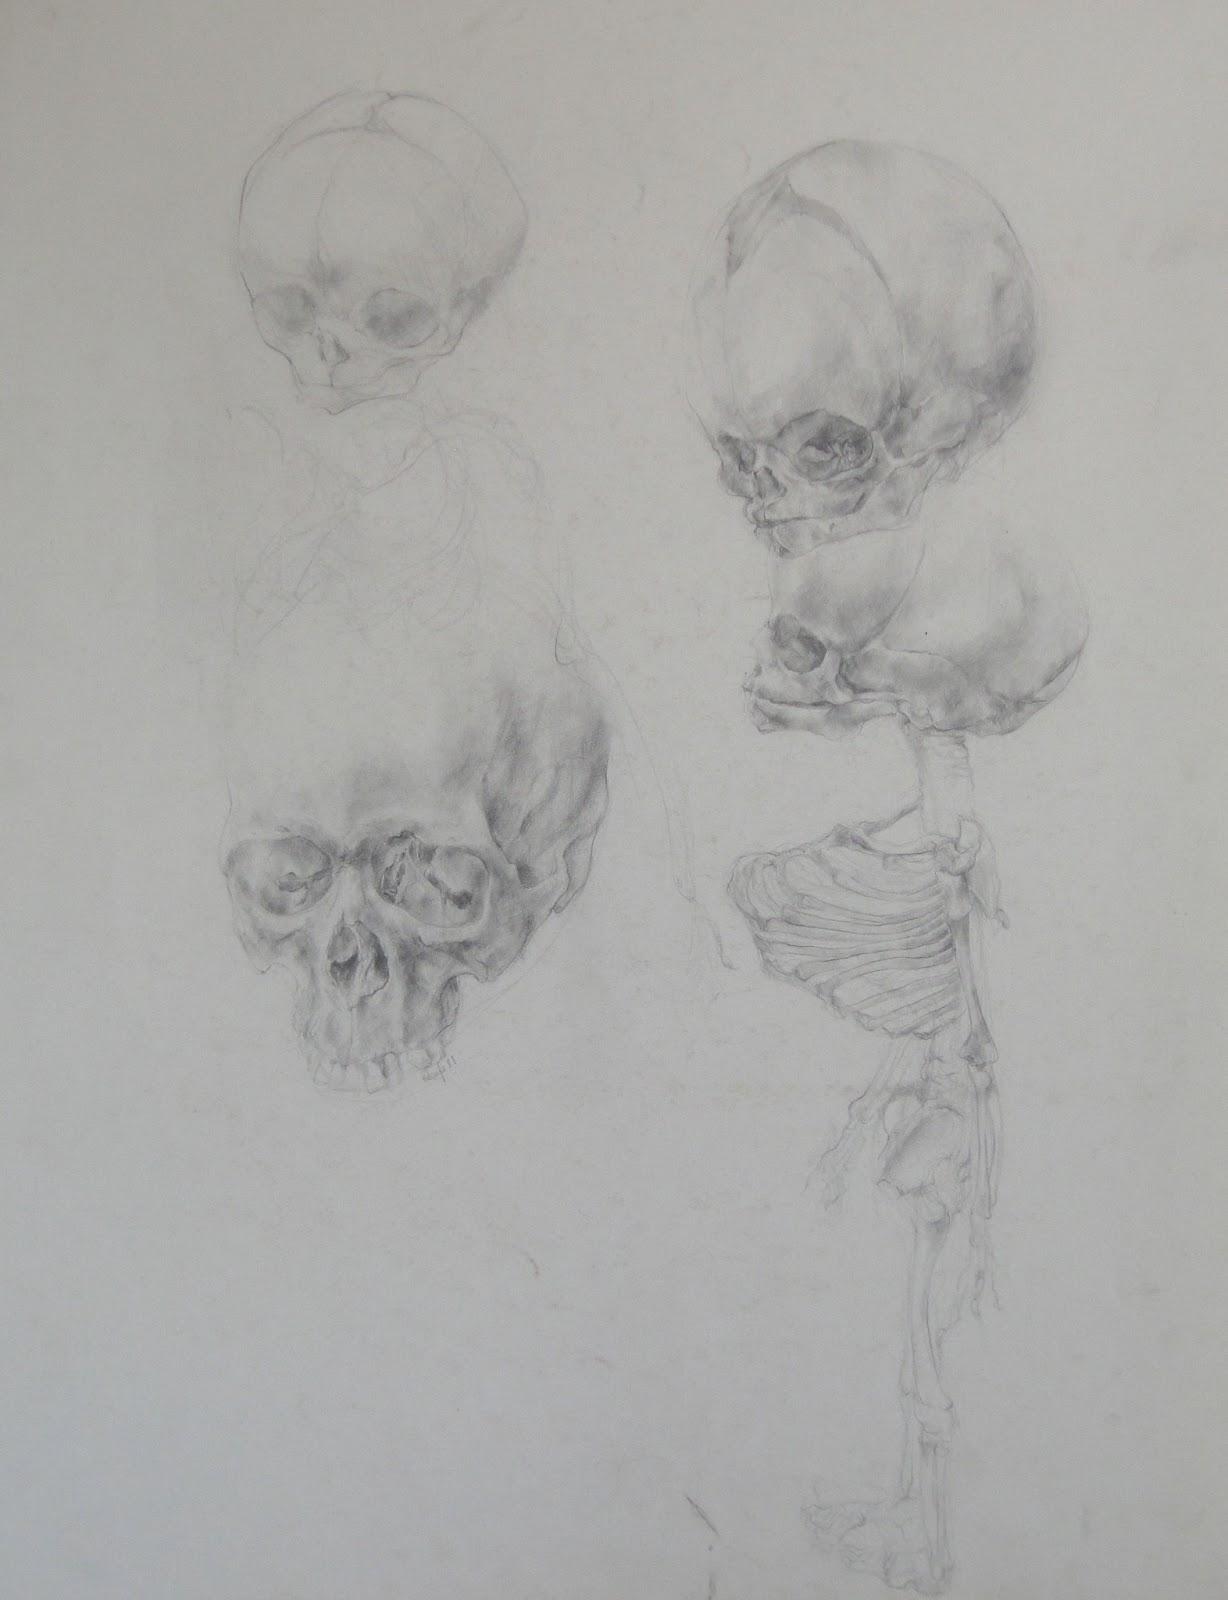 Steven Rhude - Paintings: Anatomy; Still an Option